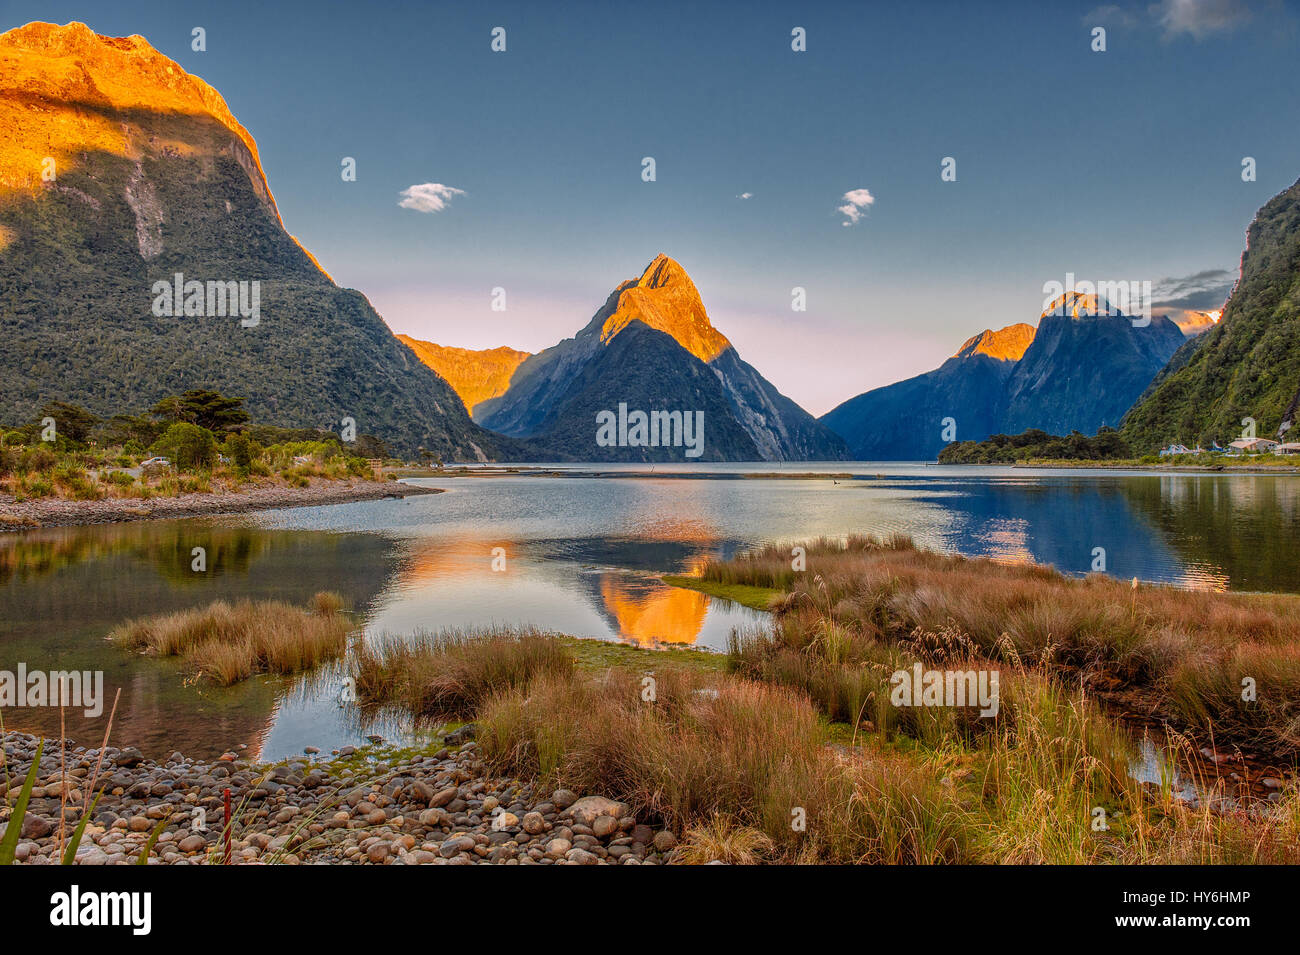 Amanecer en Milford Sound, Fiordlands National Park, Nueva Zelanda Imagen De Stock